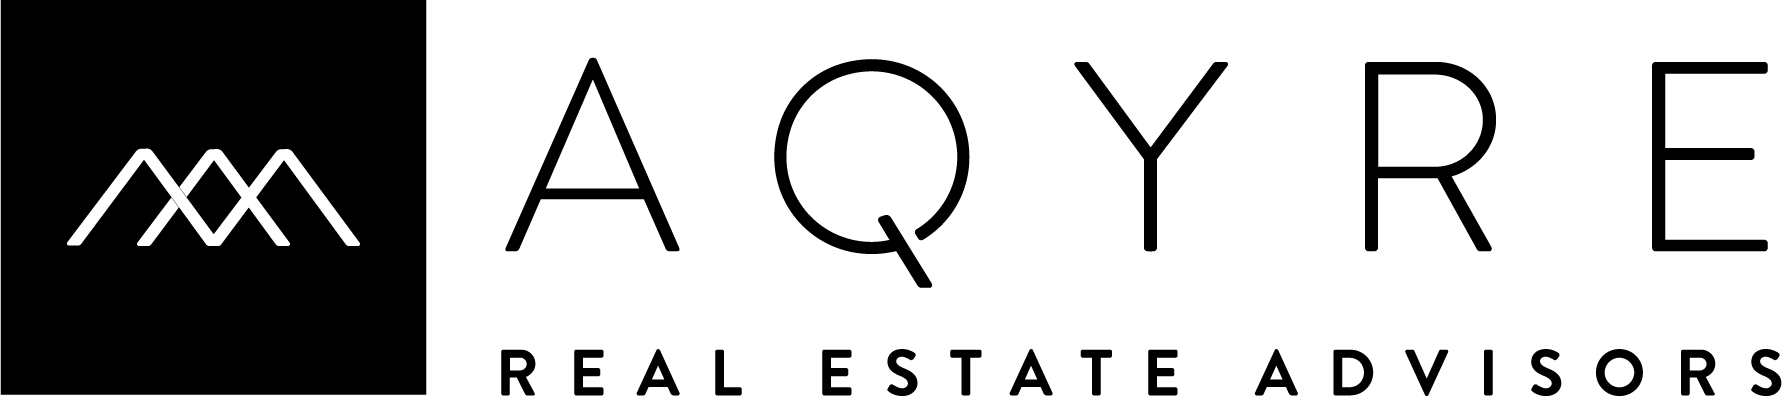 Aqyre Real Estate Advisors logo